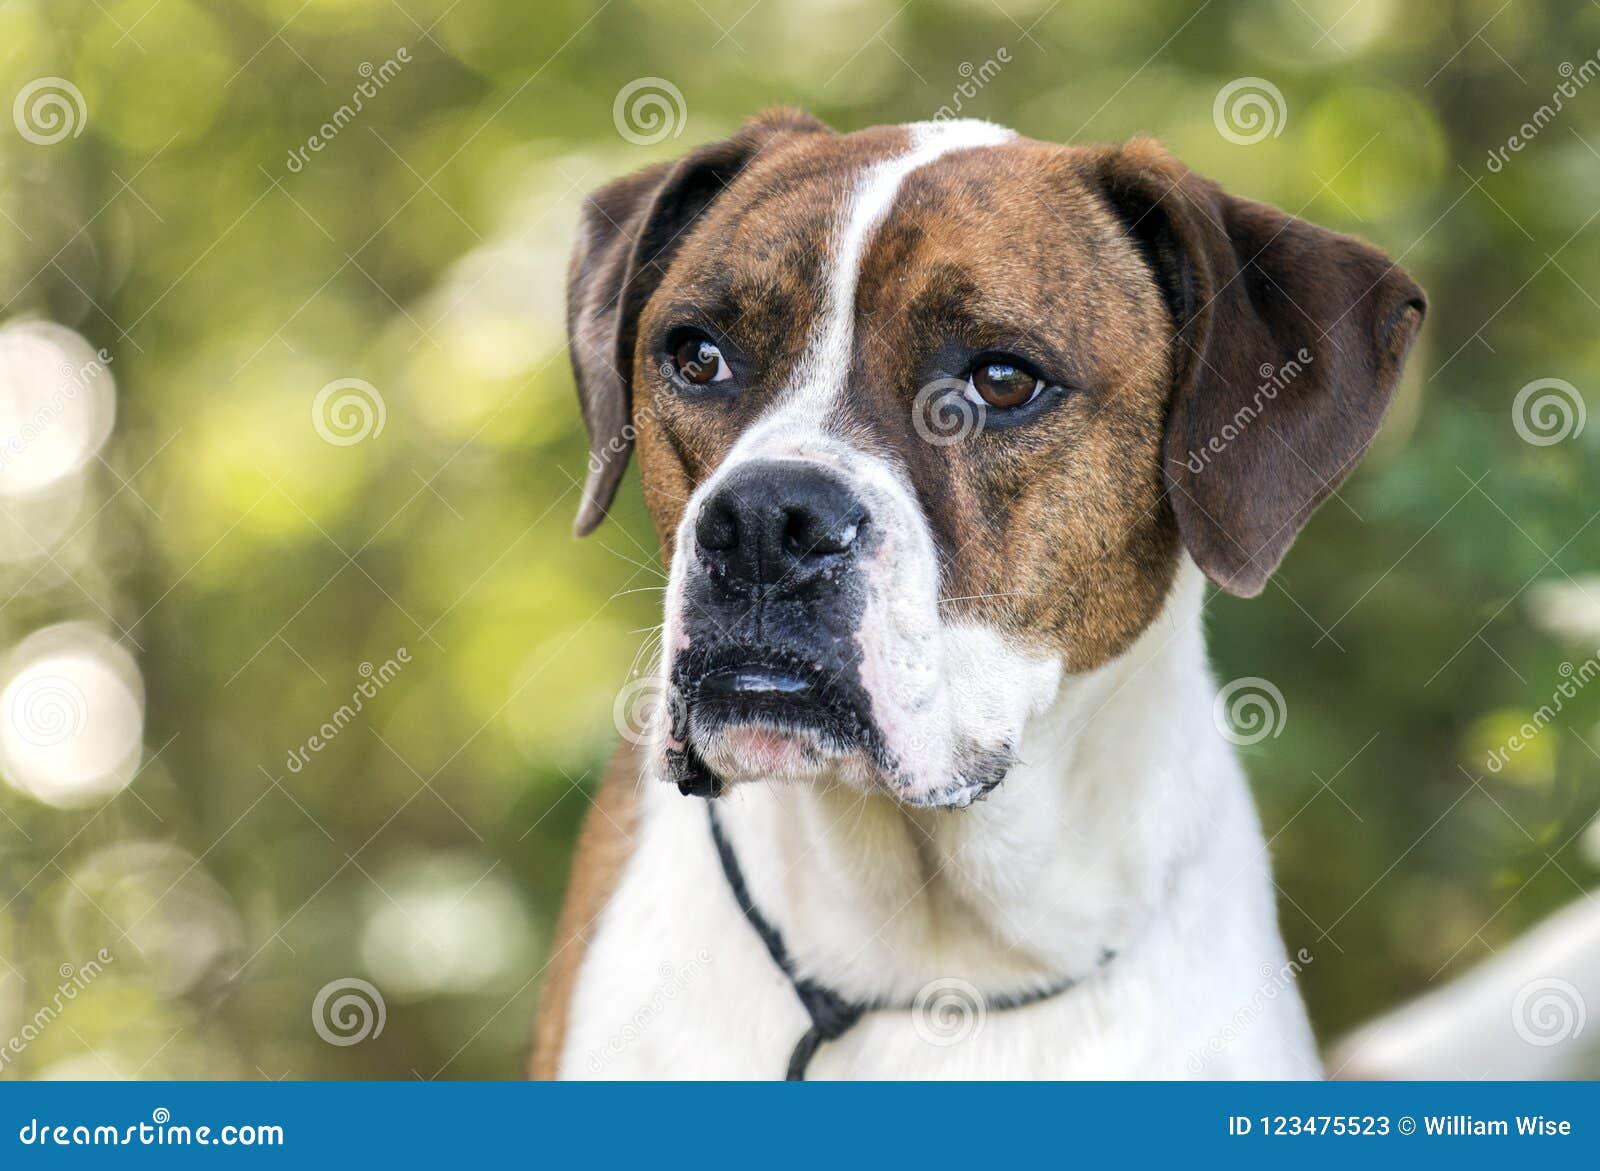 Boxer American Bulldog Mixed Breed Dog Stock Image - Image of bull